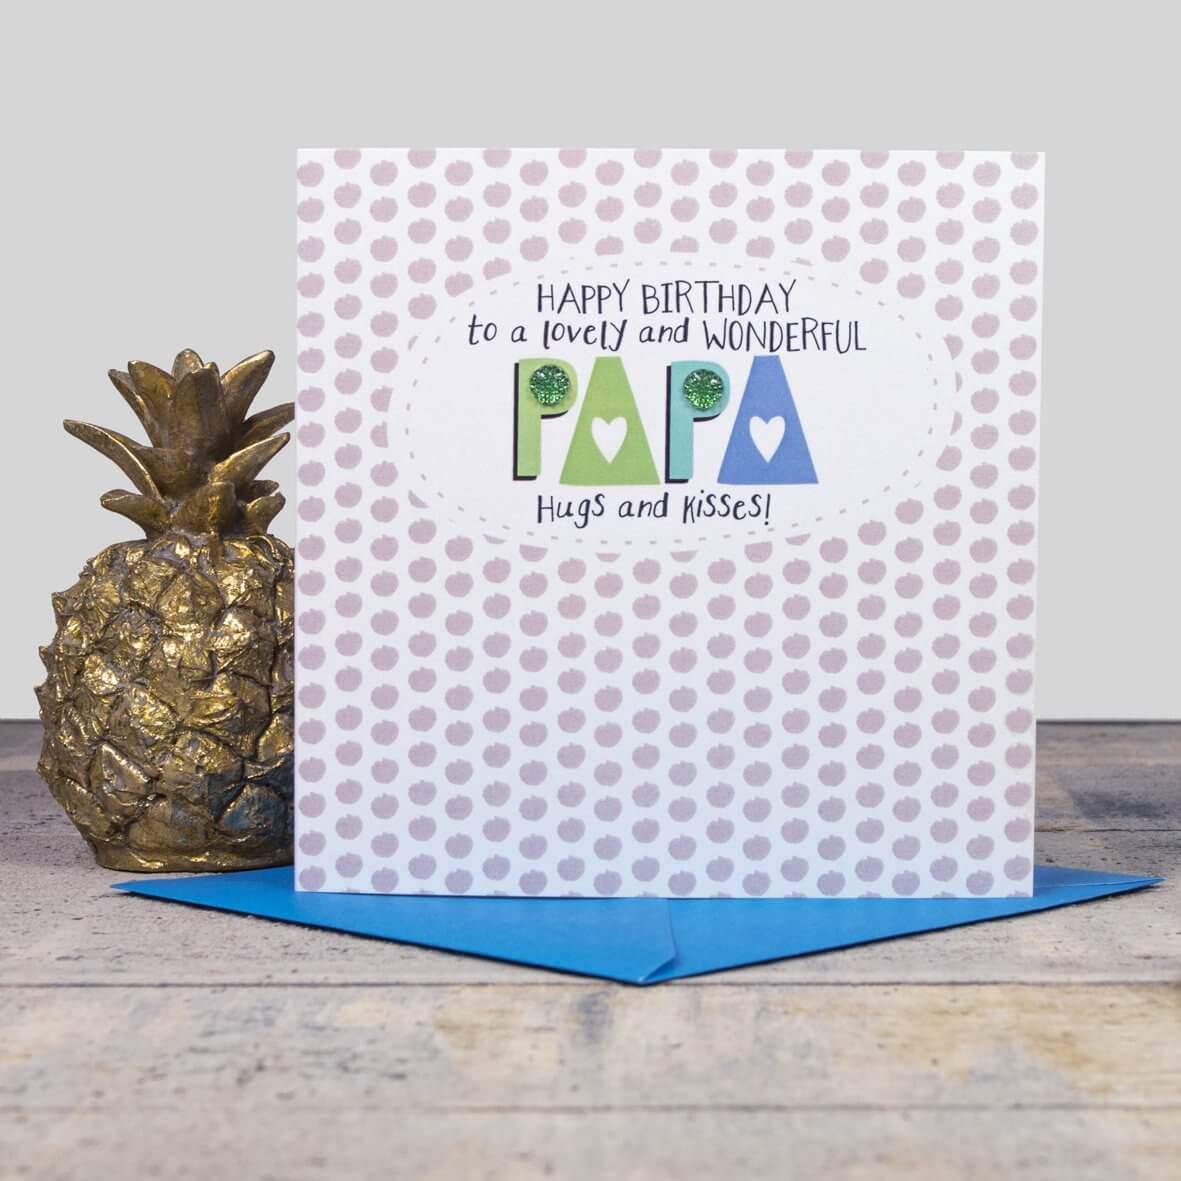 Wonderful Papa - Happy Birthday